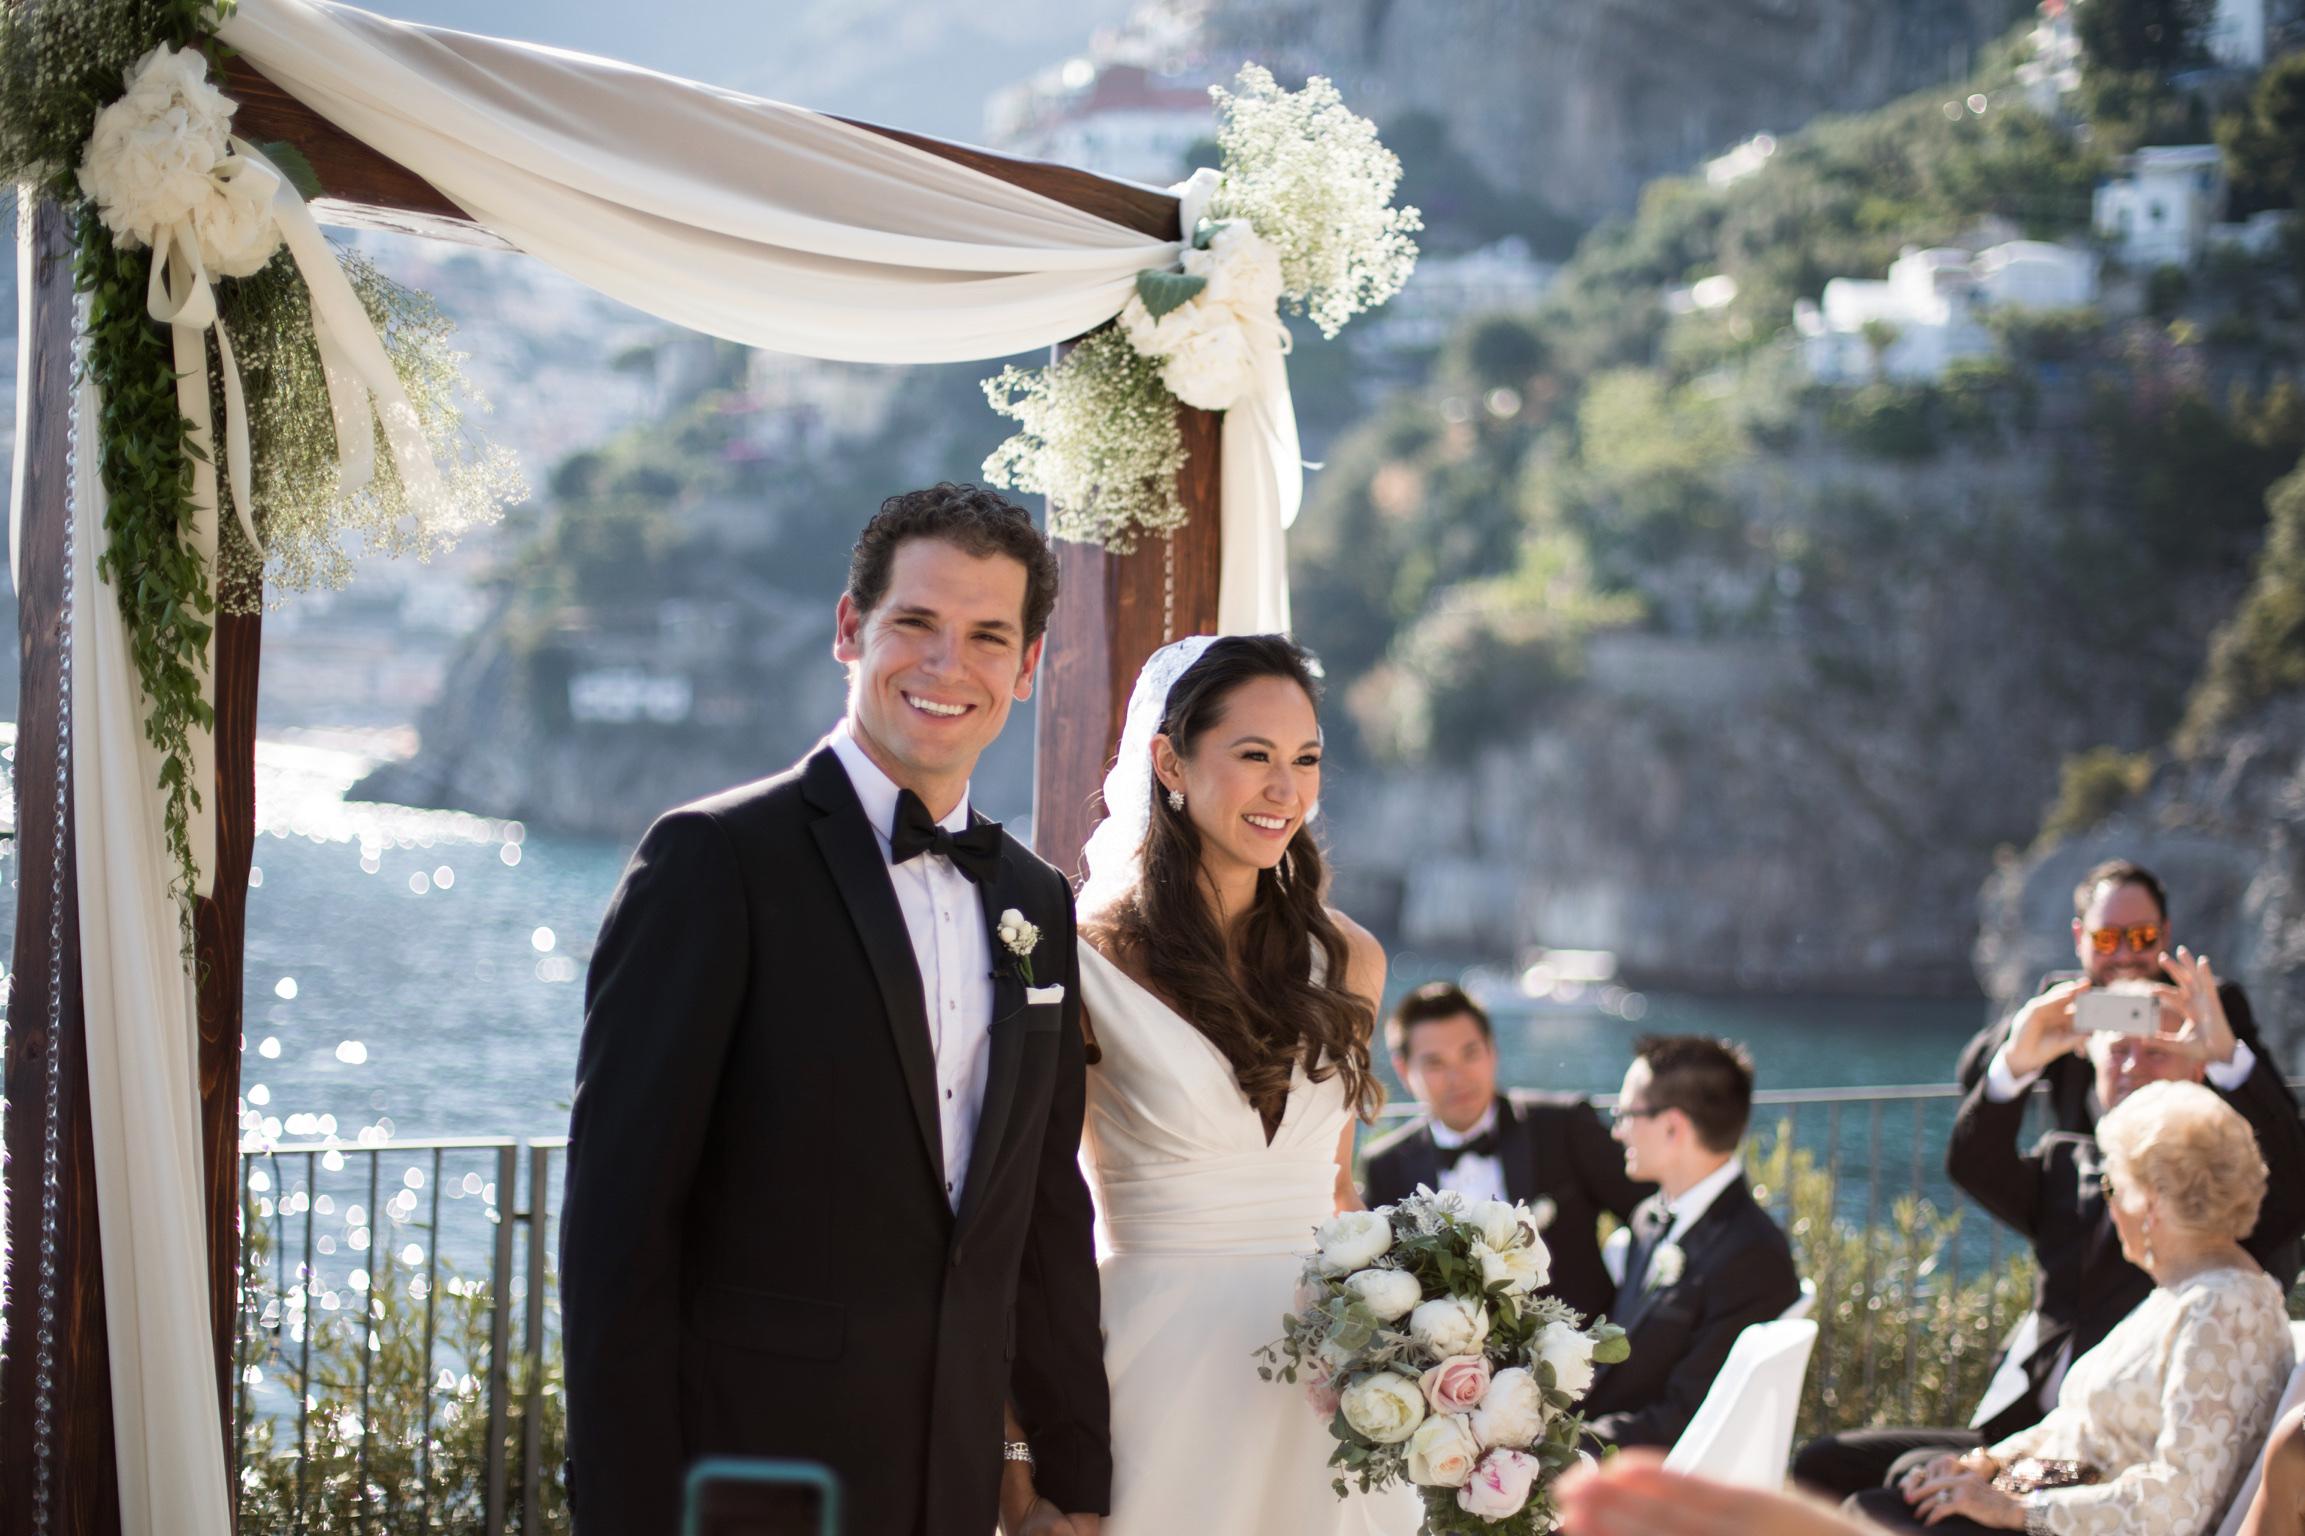 https://www.weddingamalfi.com/wp-content/uploads/Nathalie-and-Benjamin-wedding-in-Positano-8.jpg